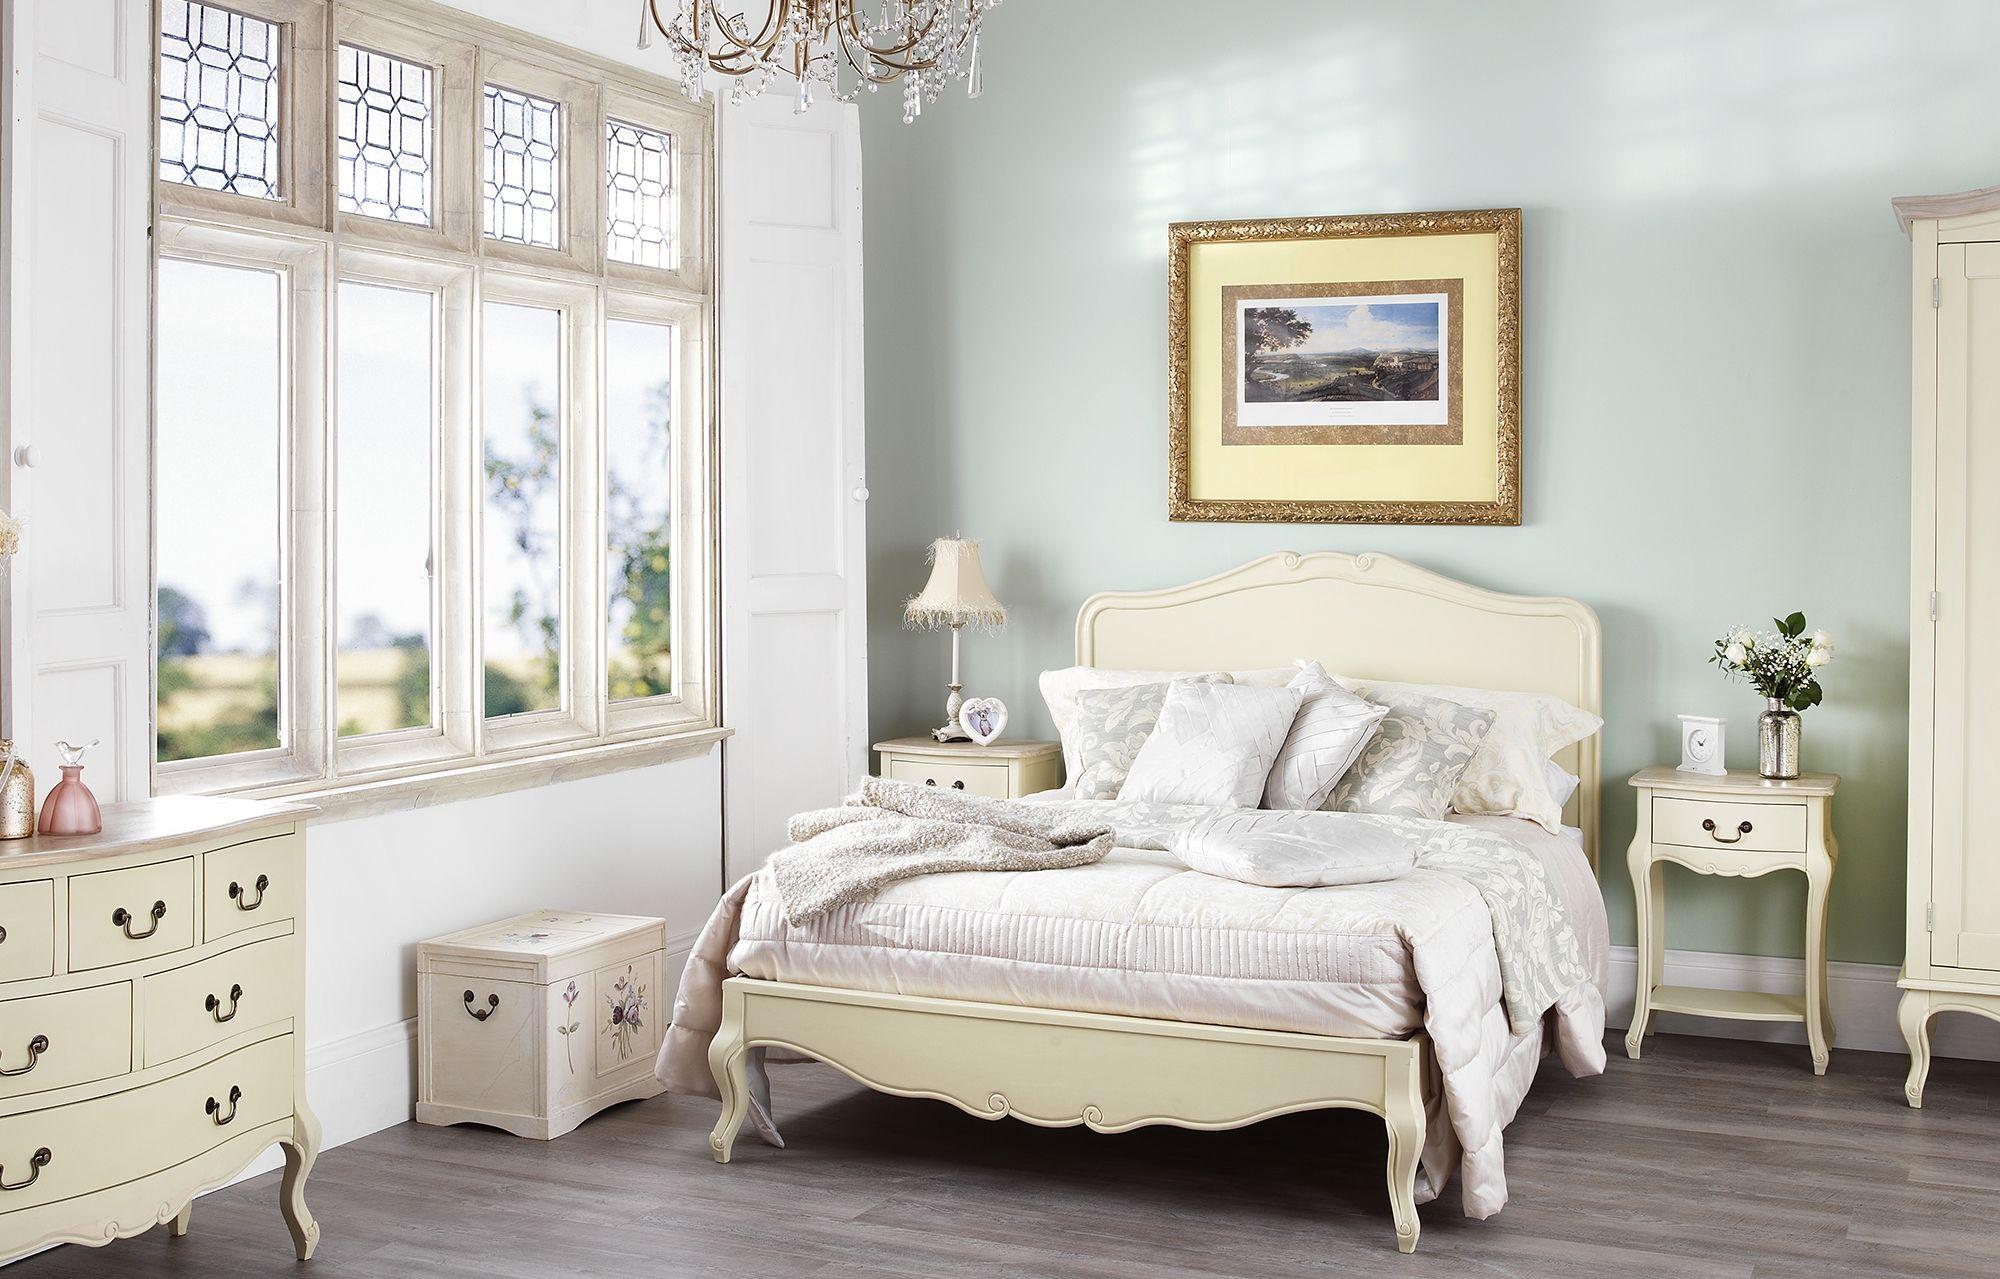 shabby chic bedroom furniture set bedroom furniture pinterest rh pinterest co uk white shabby chic bedroom furniture sets white shabby chic bedroom furniture sets